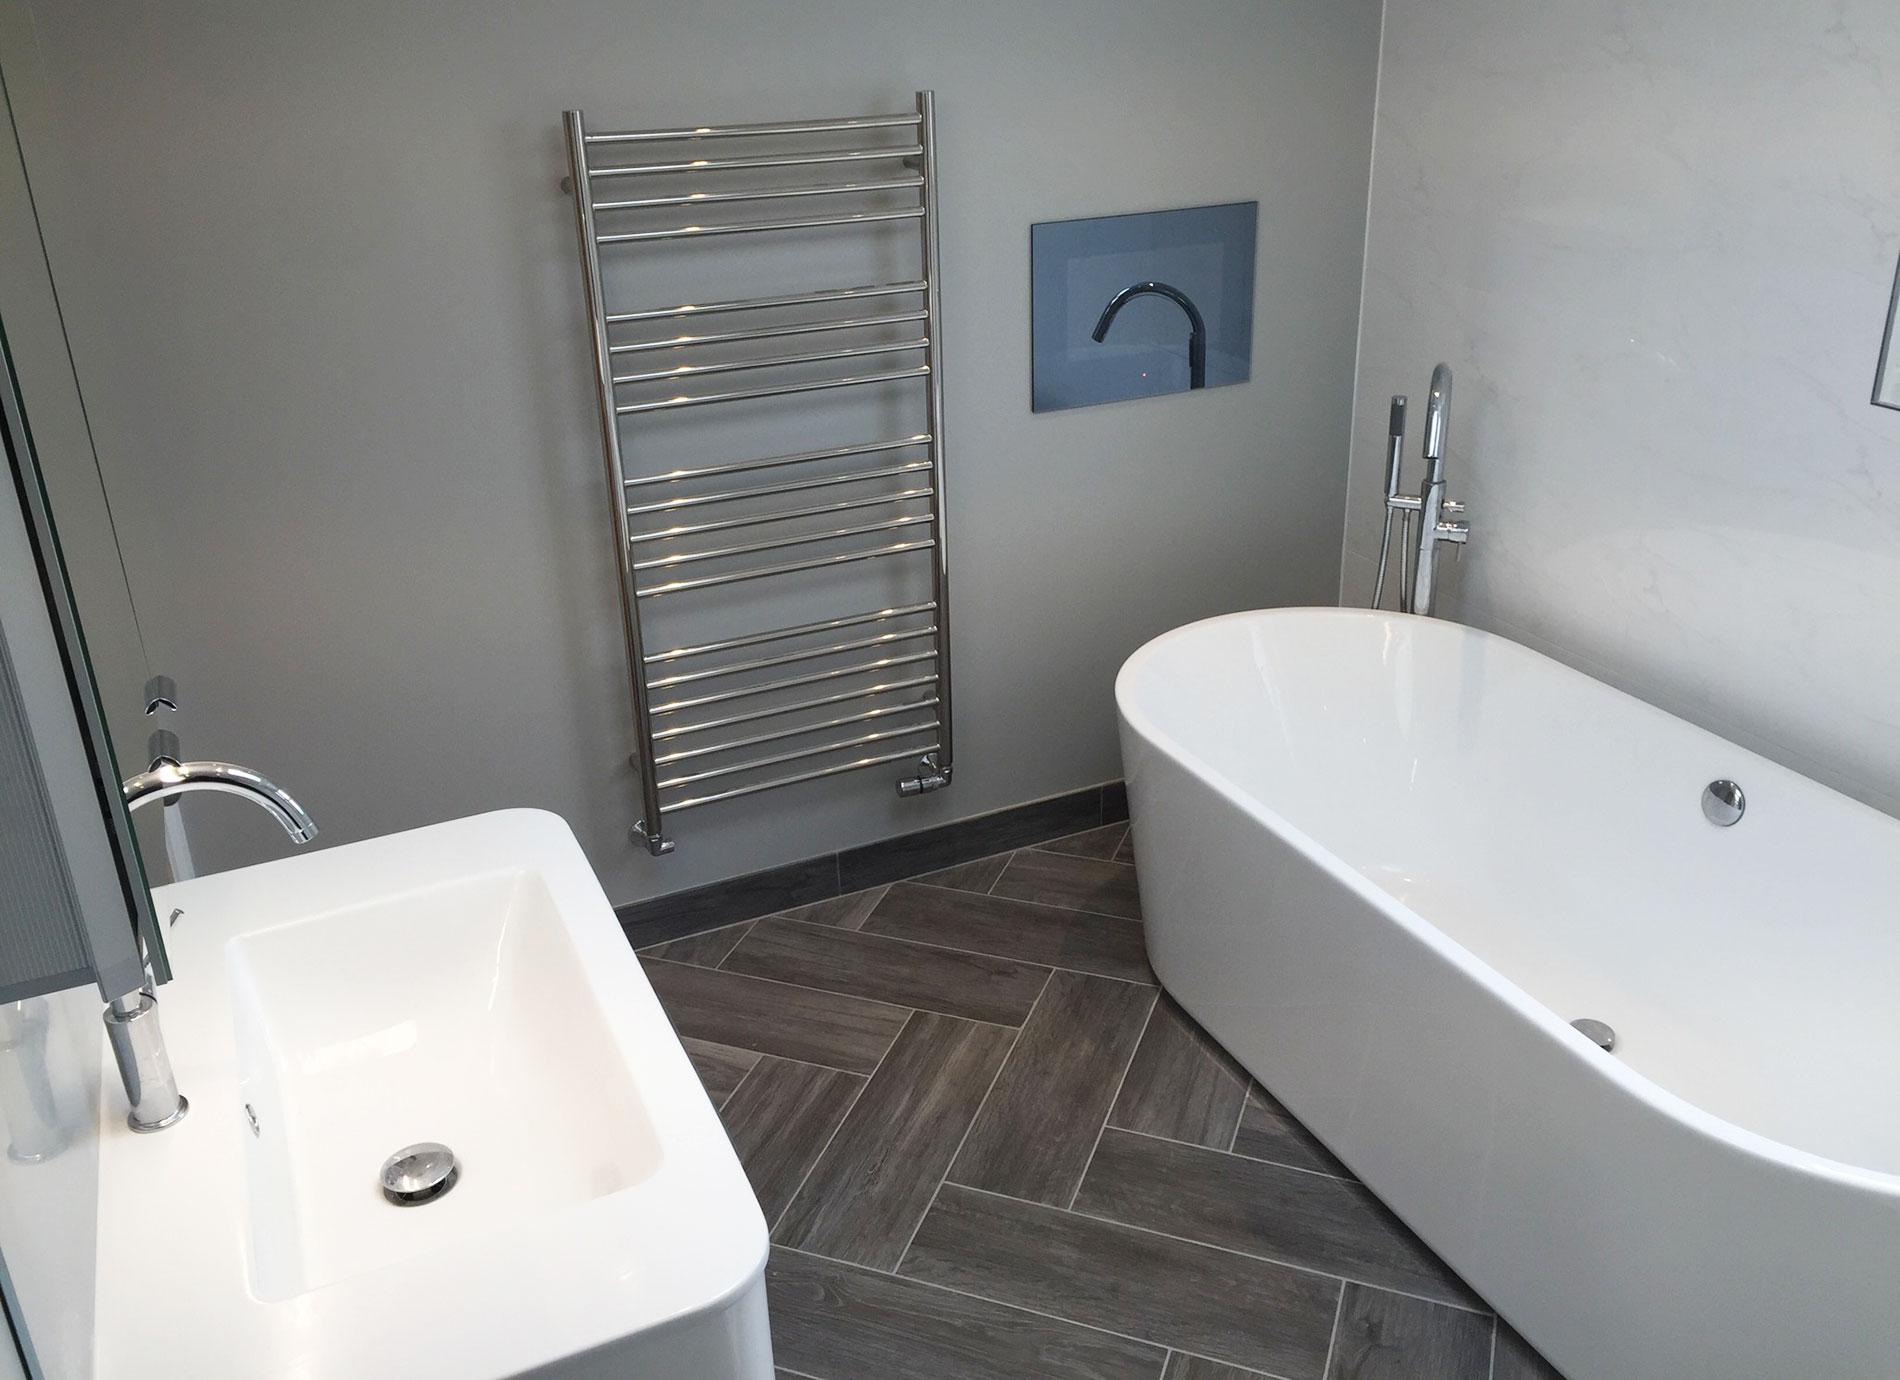 bathroom fitters london   bathroom installation, design & supply